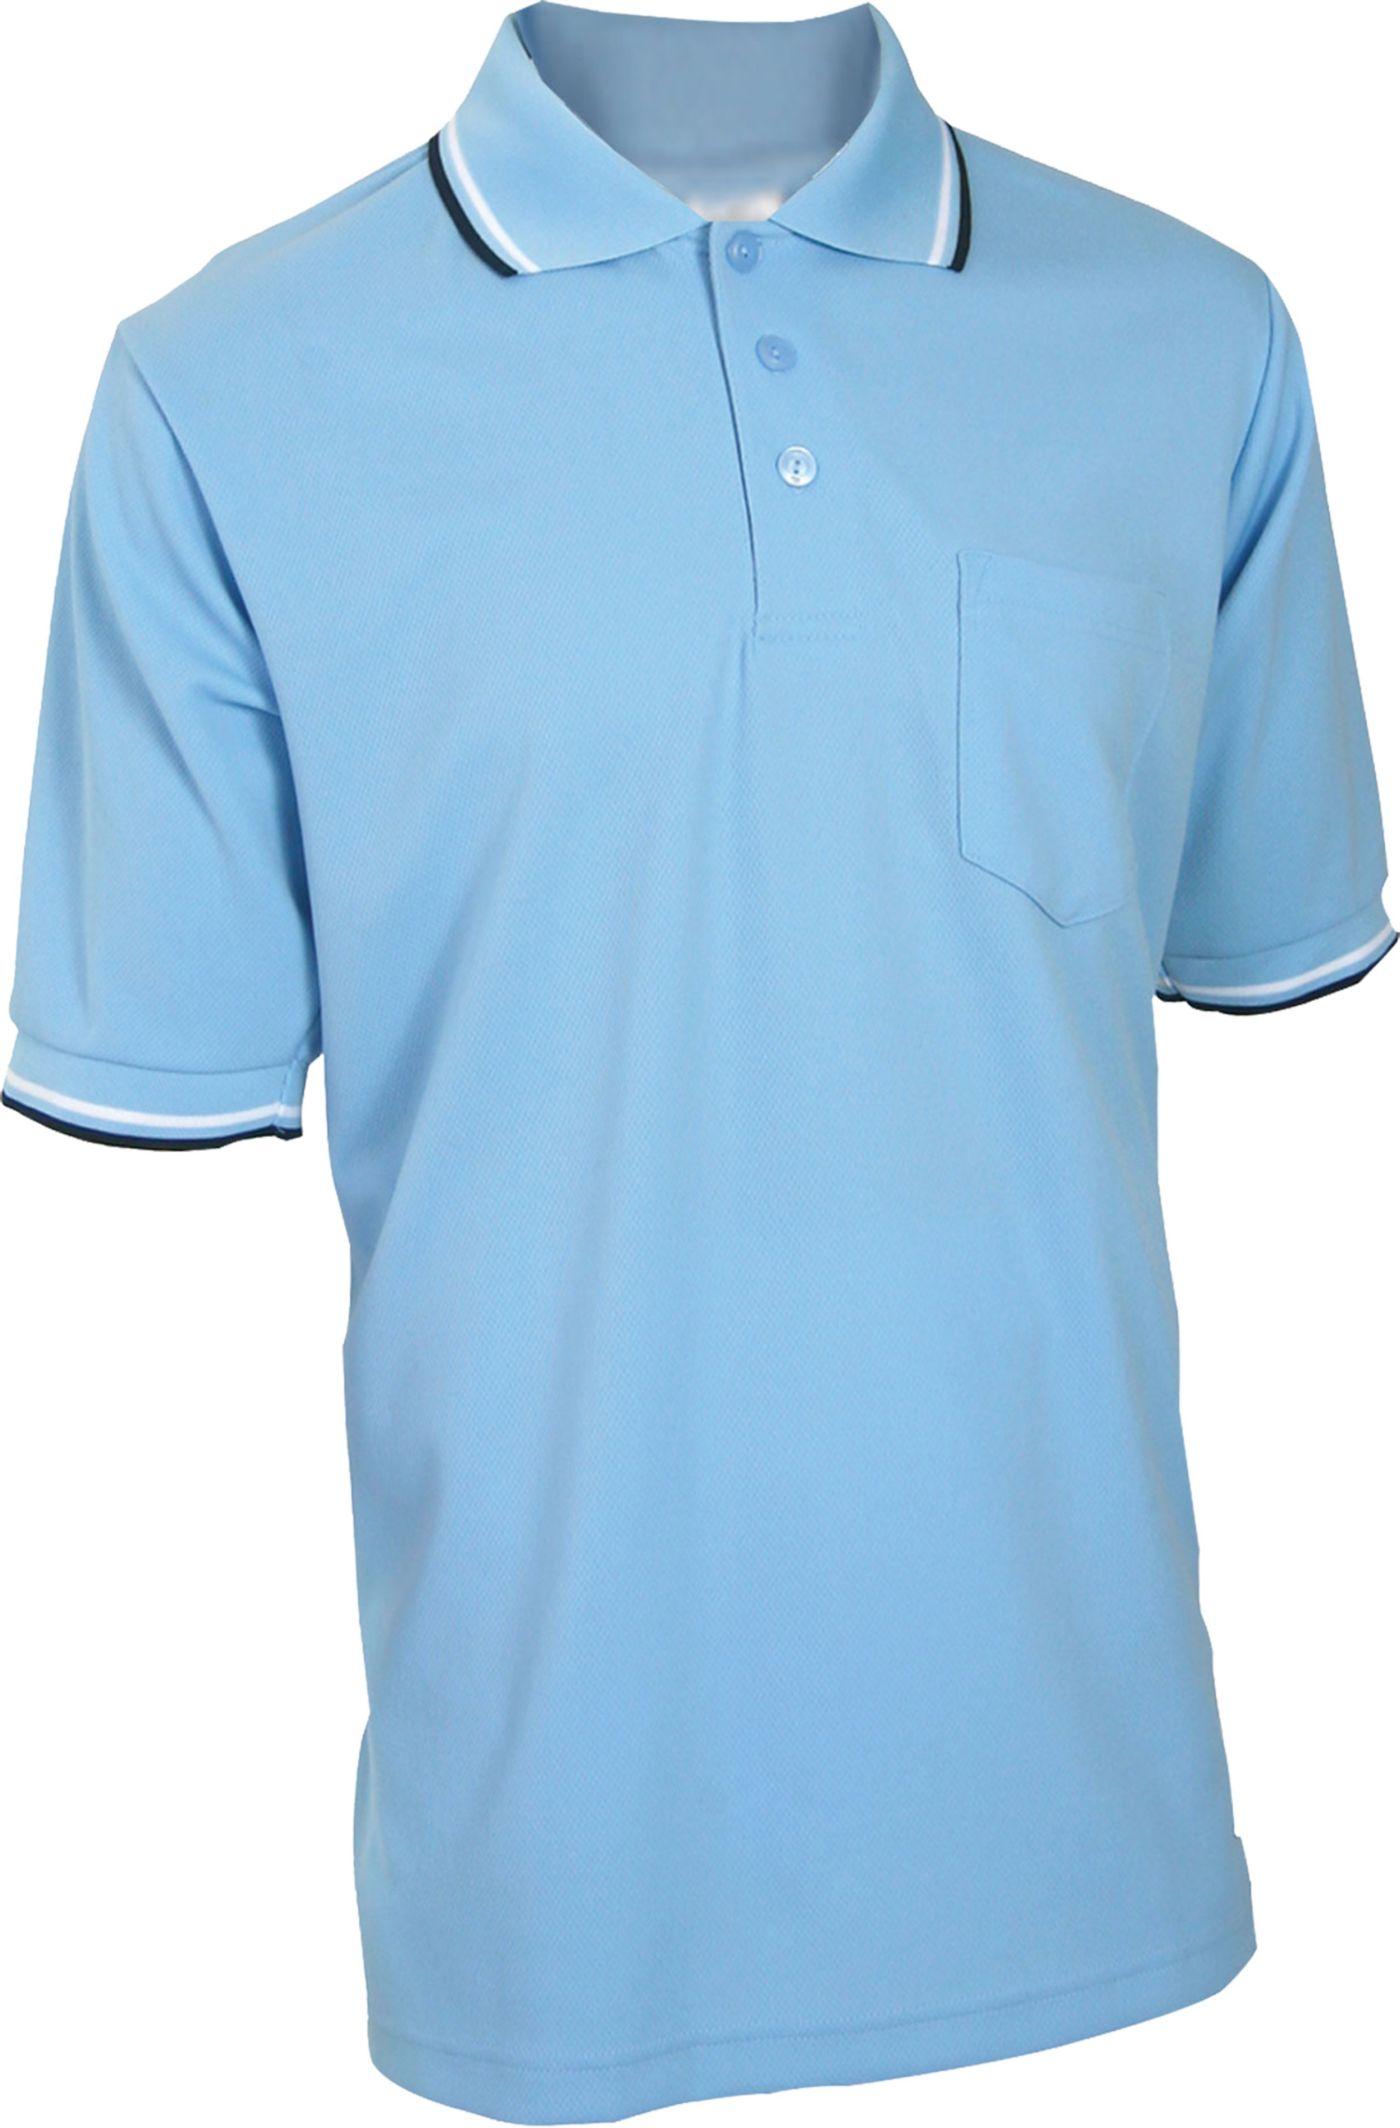 Smitty Adult Short Sleeve Umpire Shirt